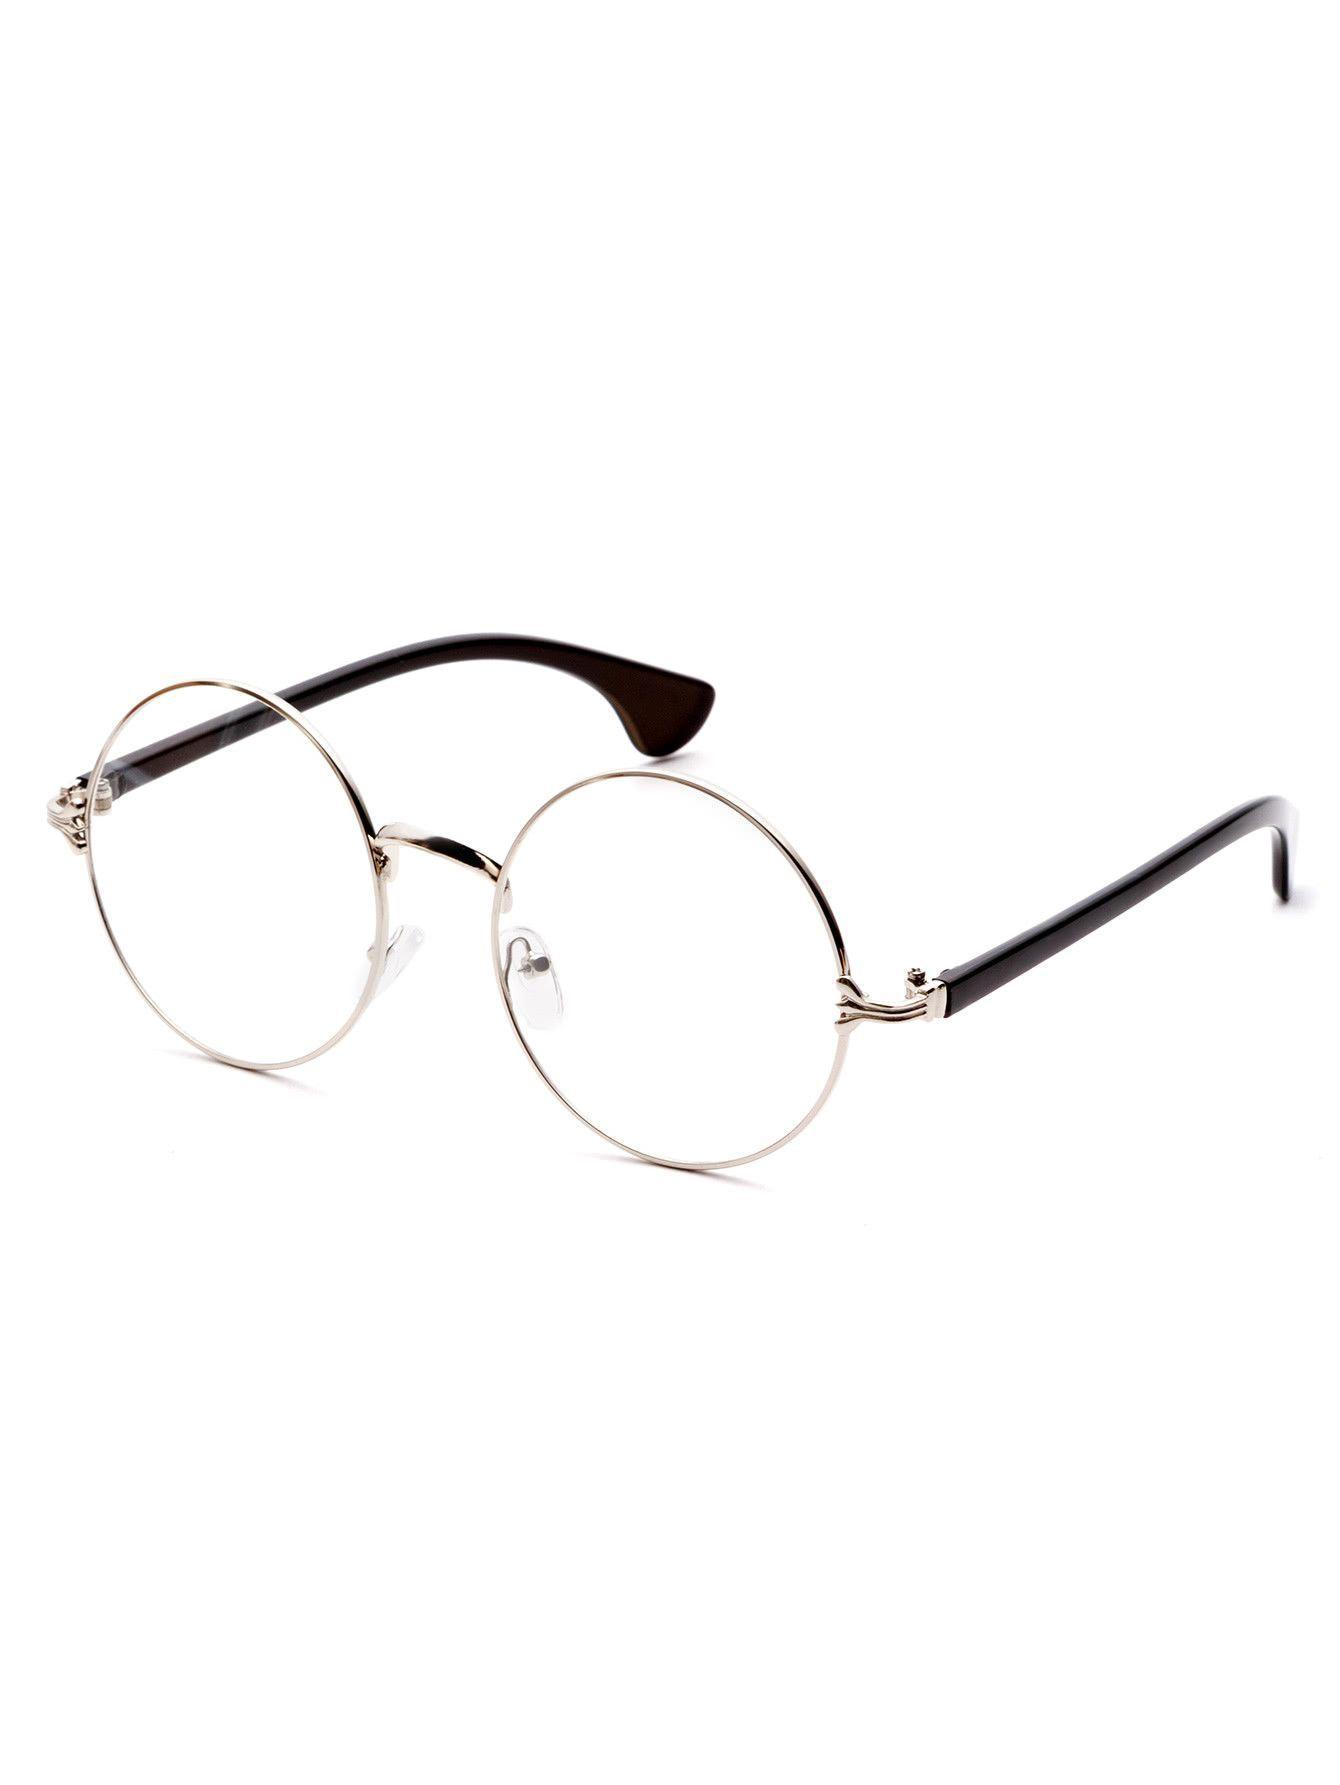 d87f1831825e Silver Frame Black Arm Clear Lens Glasses